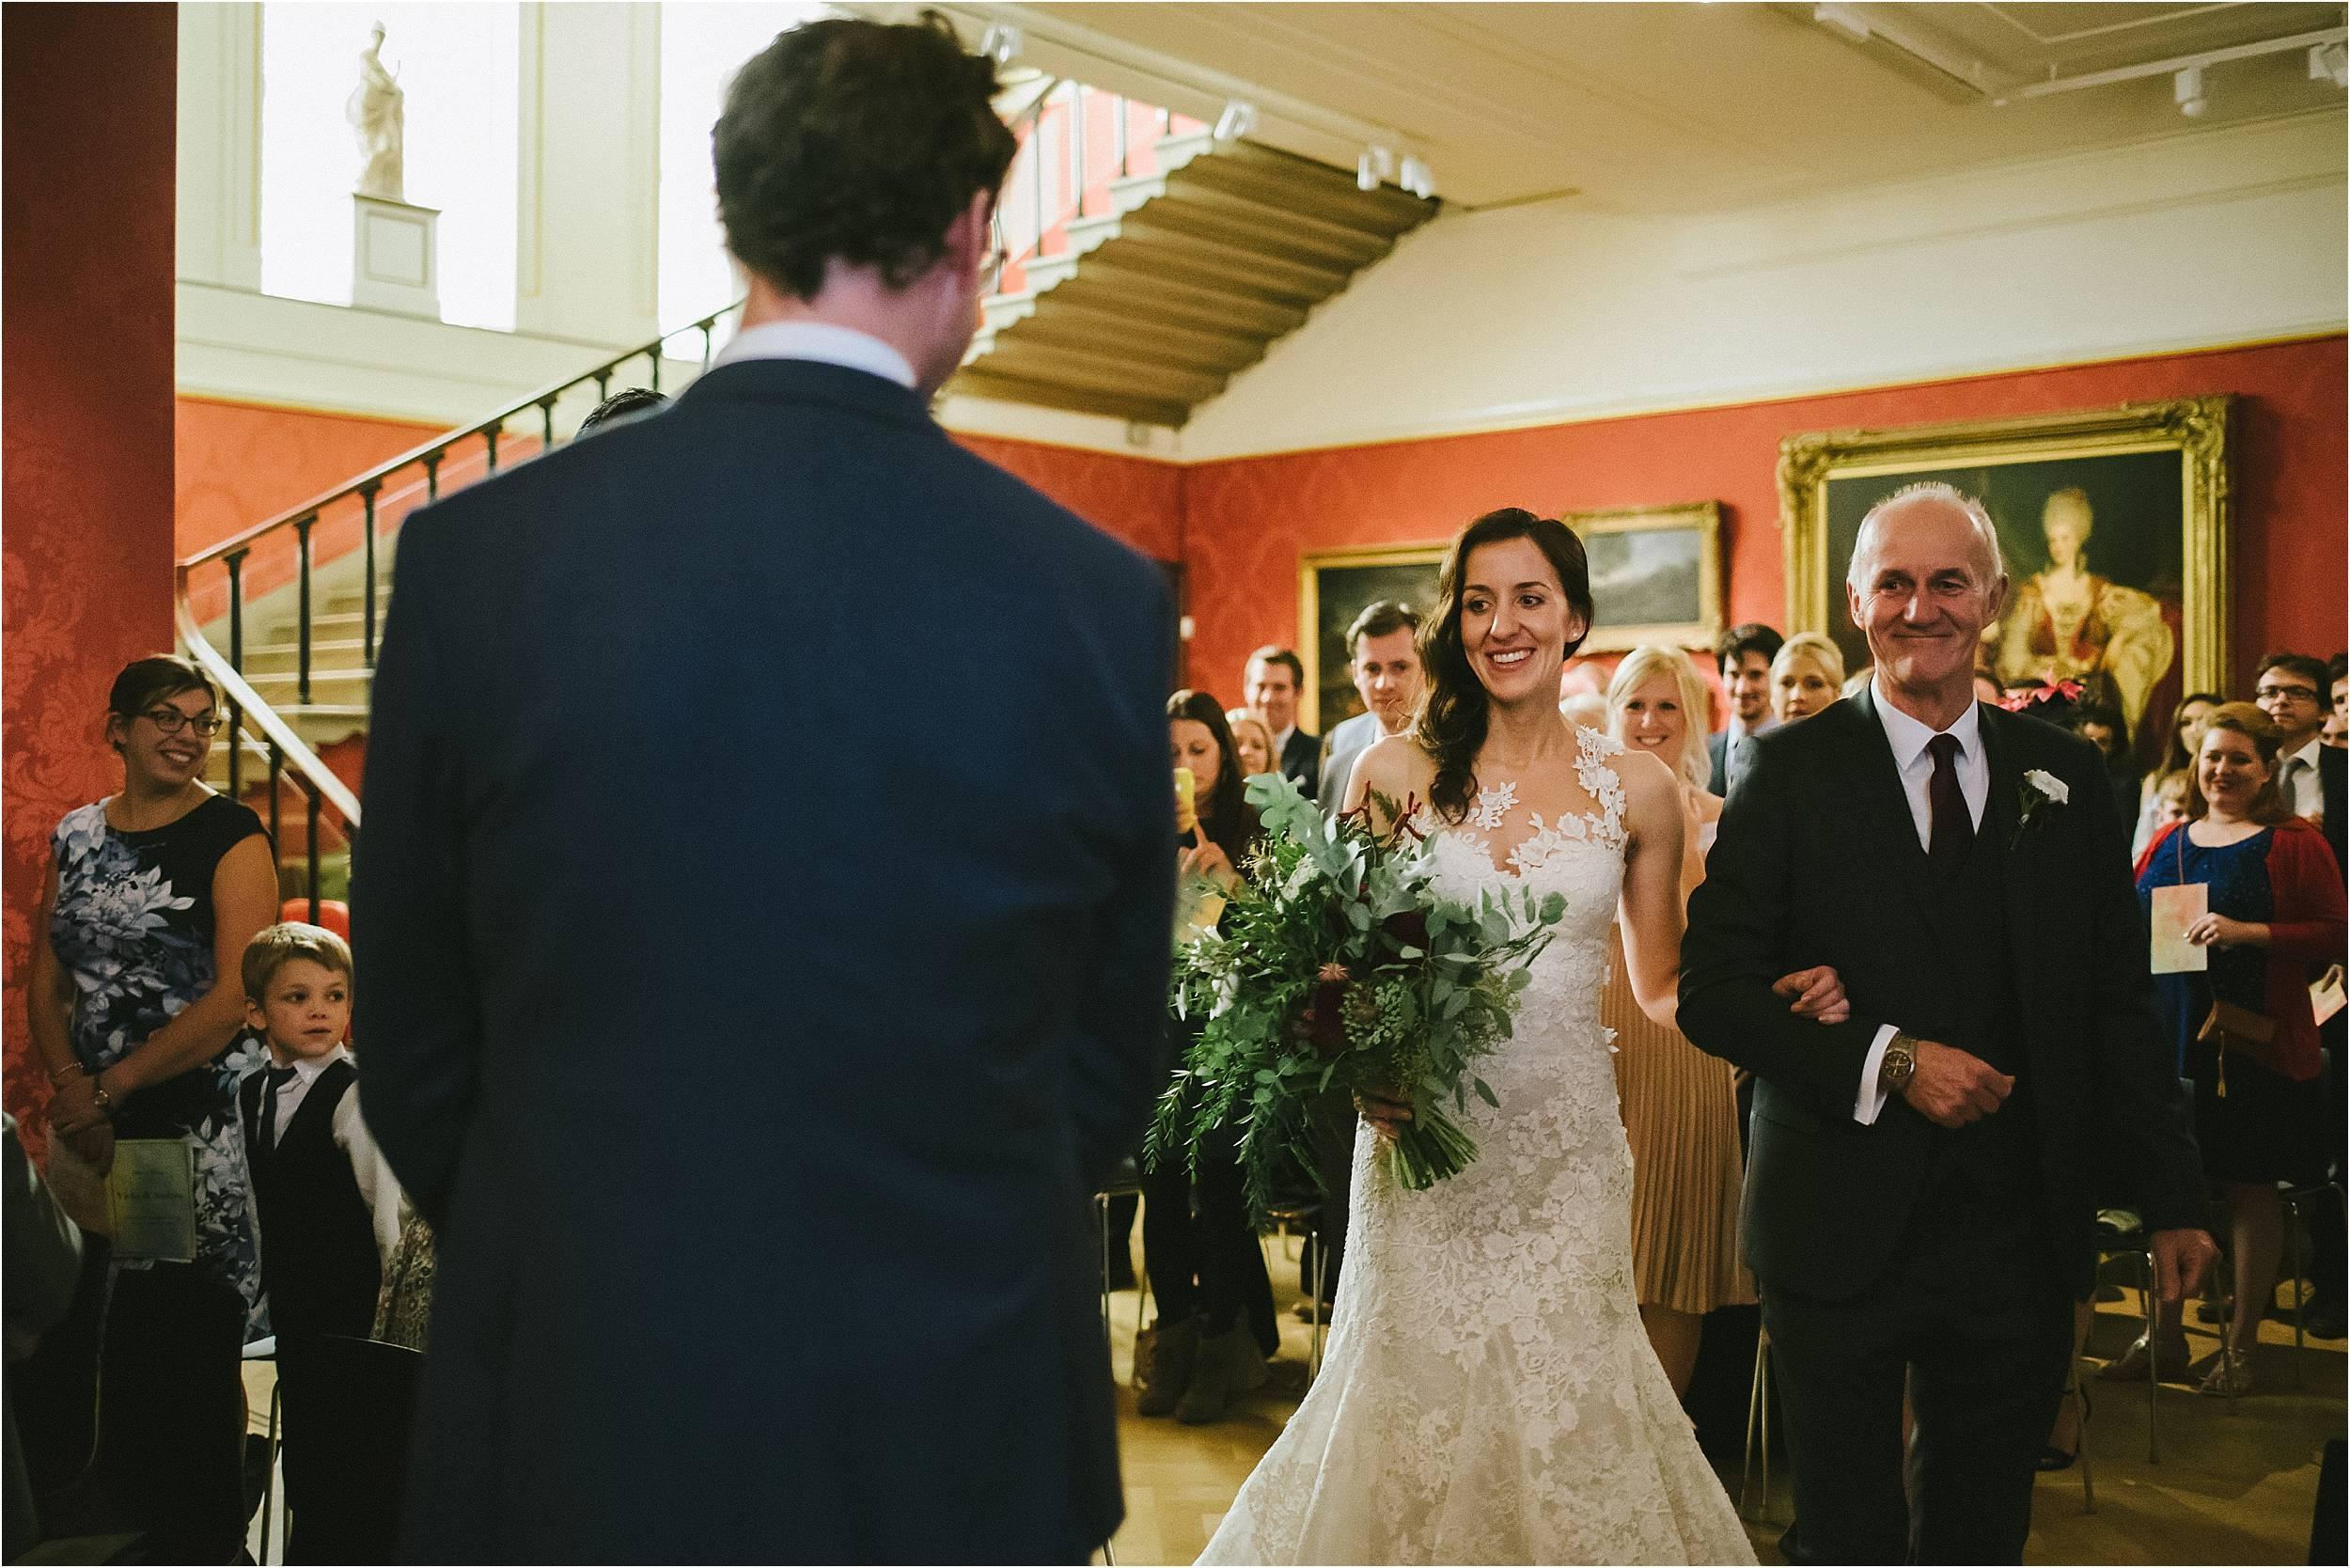 Oxford Ashmolean Museum Wedding Photography_0080.jpg